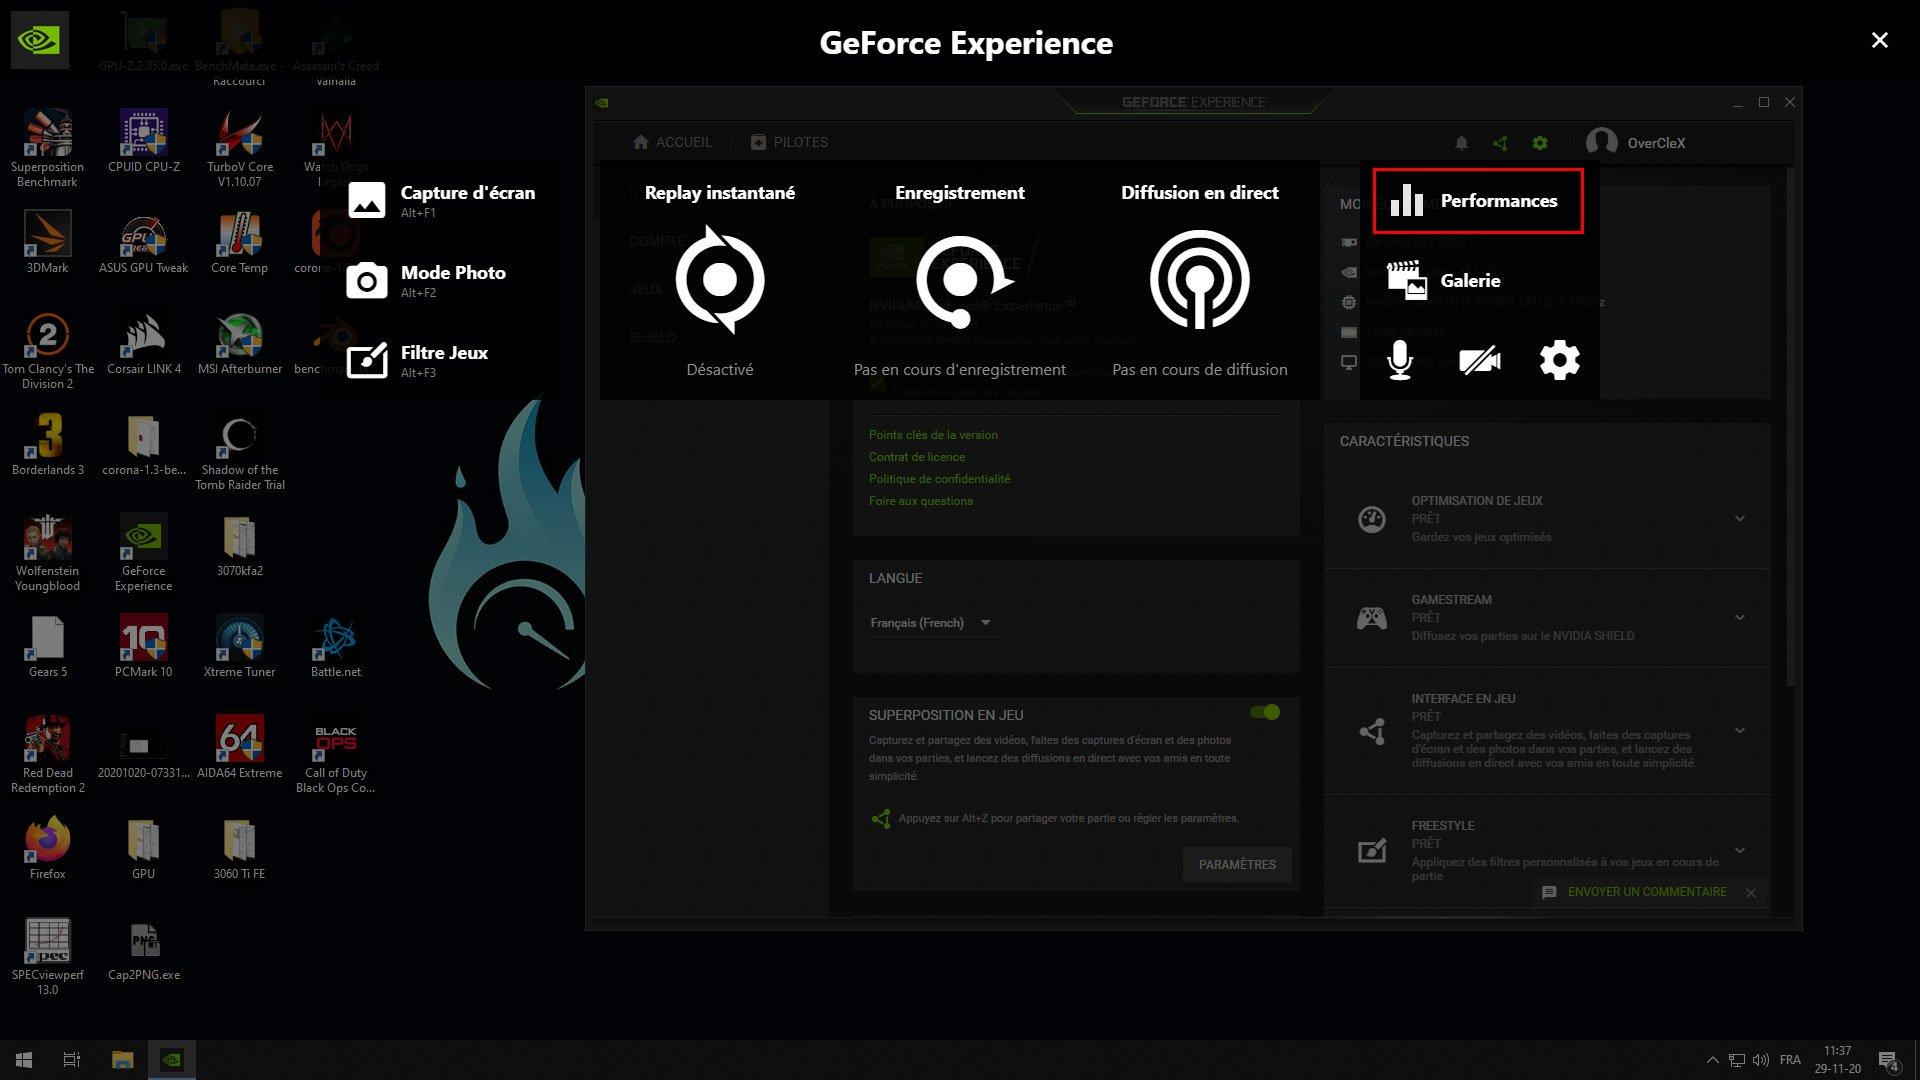 Overclocking via GeForce Experience